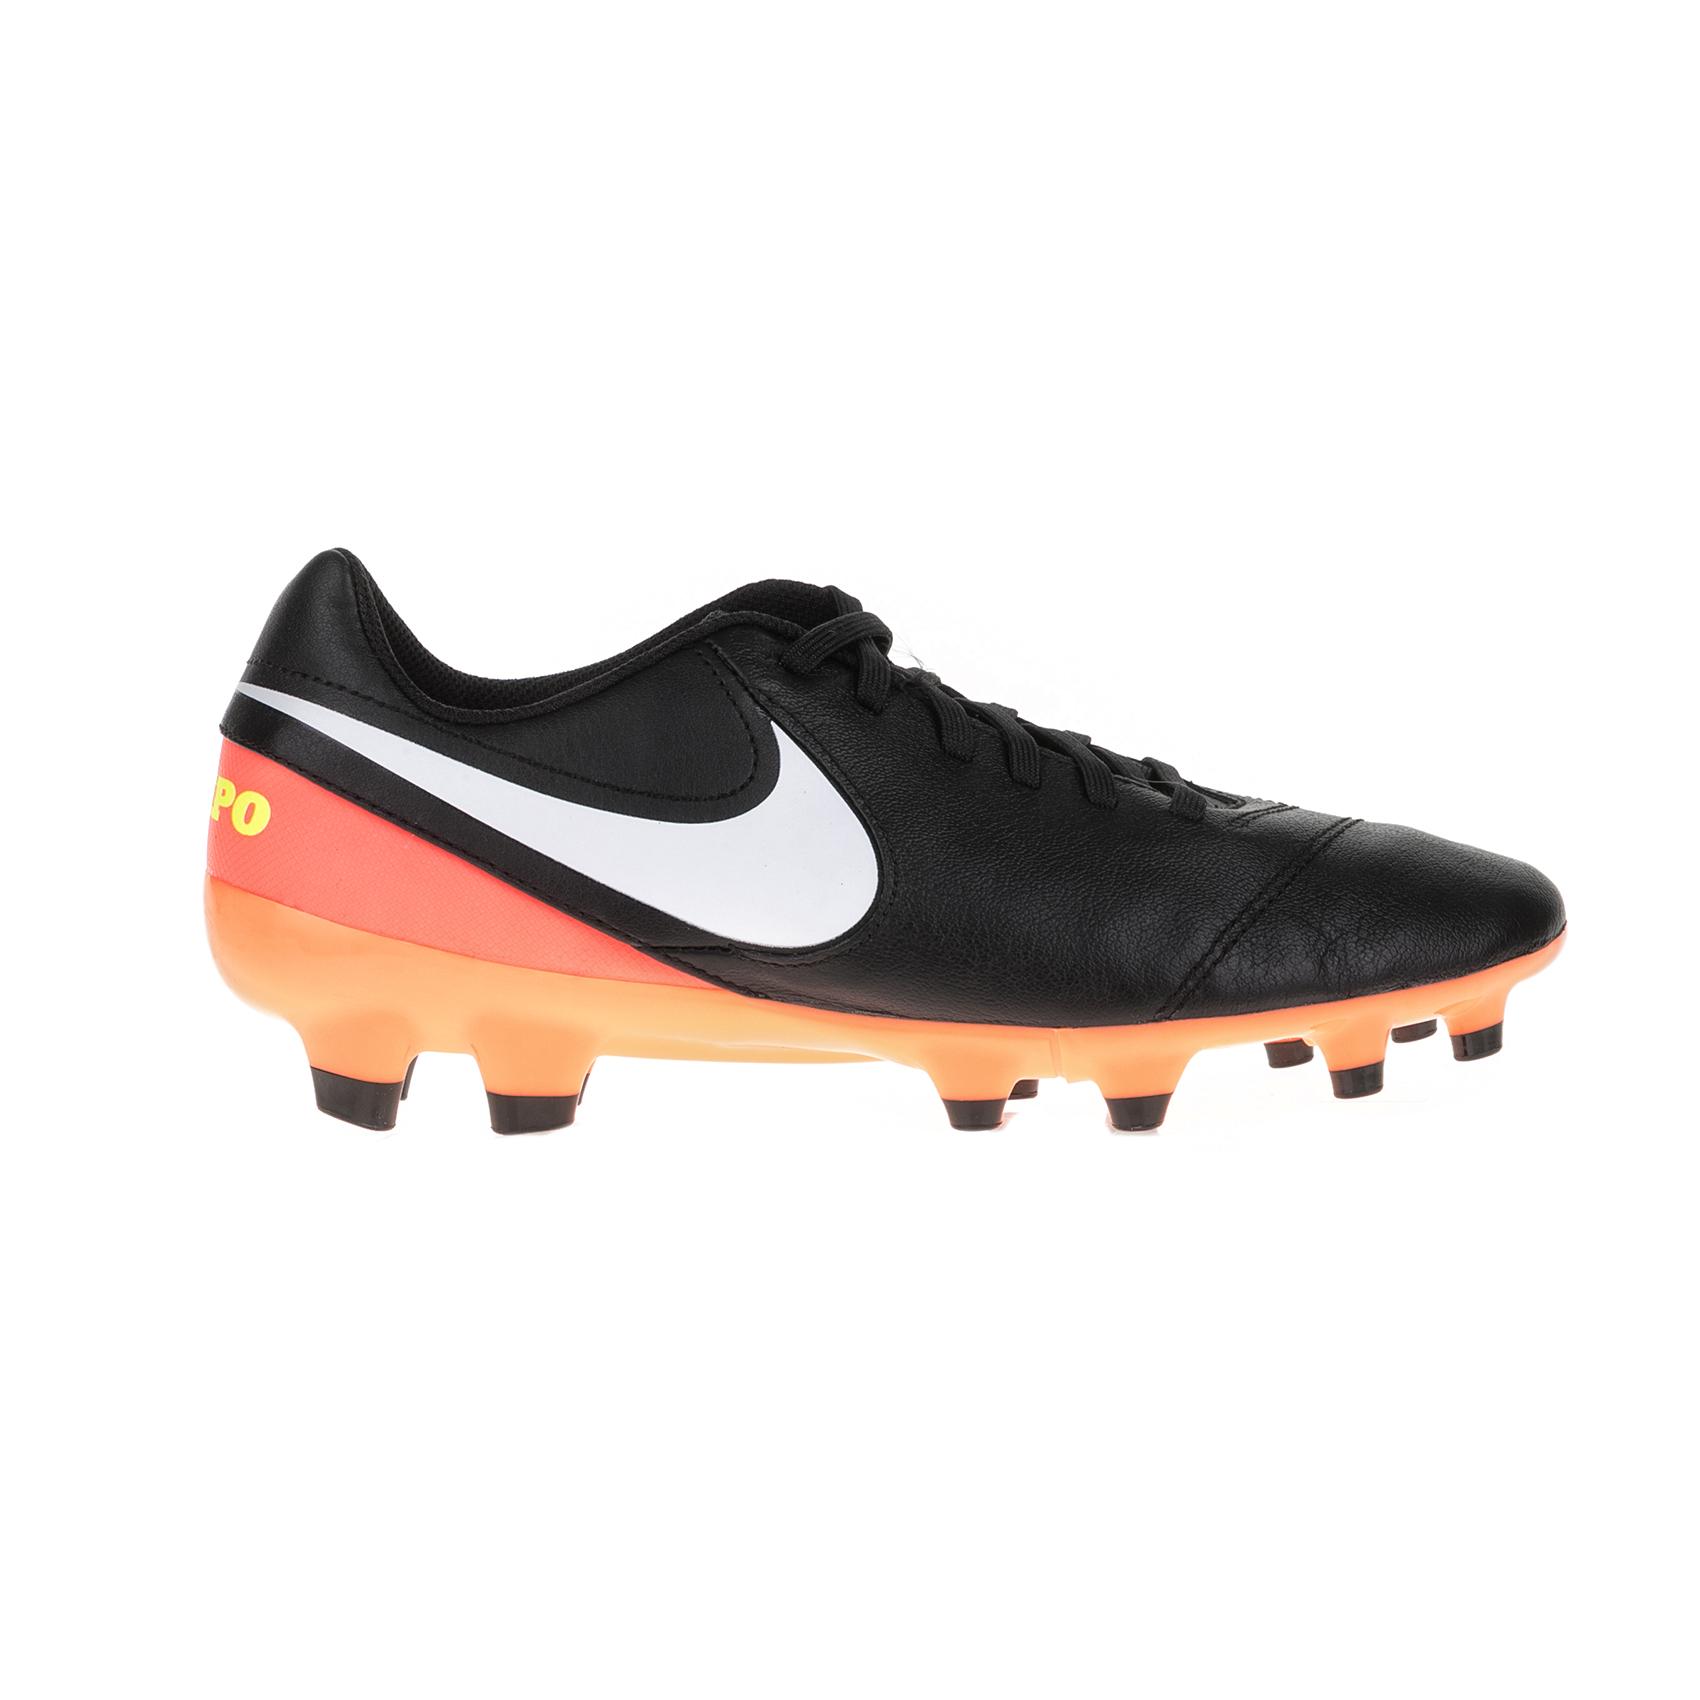 NIKE – Ανδρικά παπούτσια ποδοσφαίρου Nike TIEMPO GENIO II LEATHER FG μαύρα – πορτοκαλί